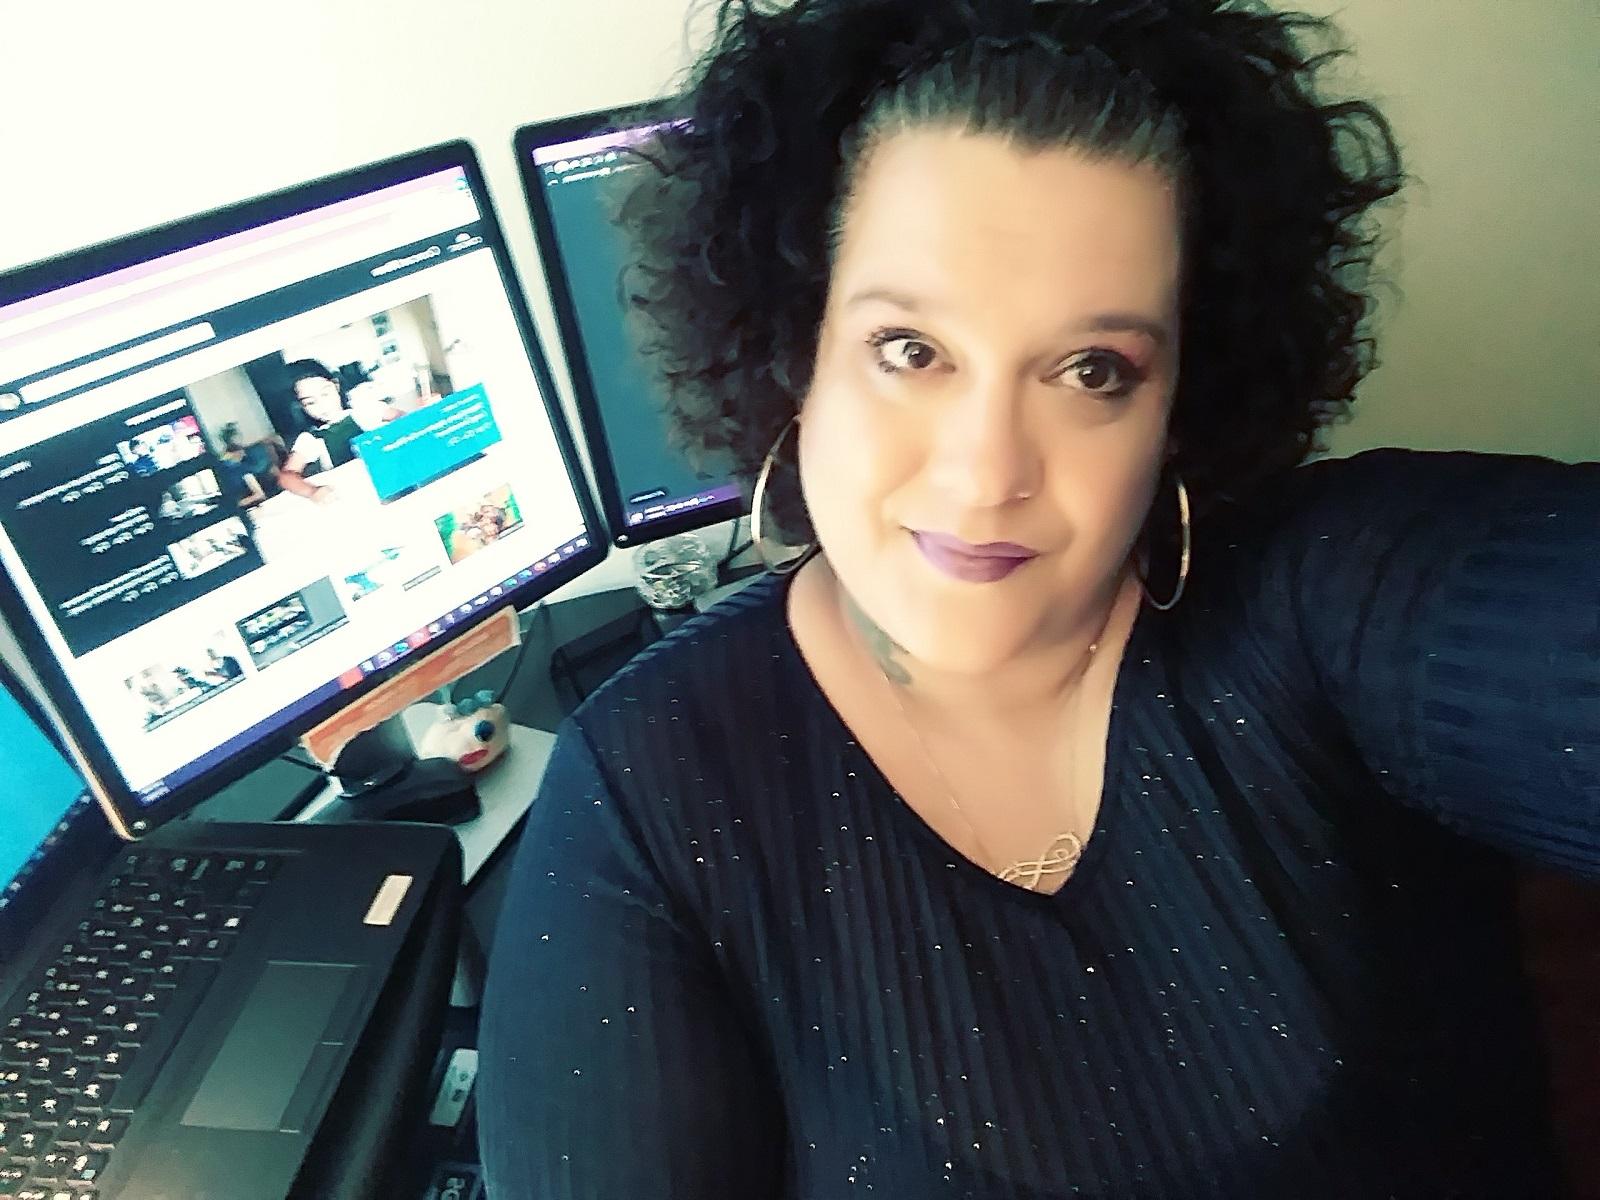 Comcast employee Amy Hazelrigg-Fowler